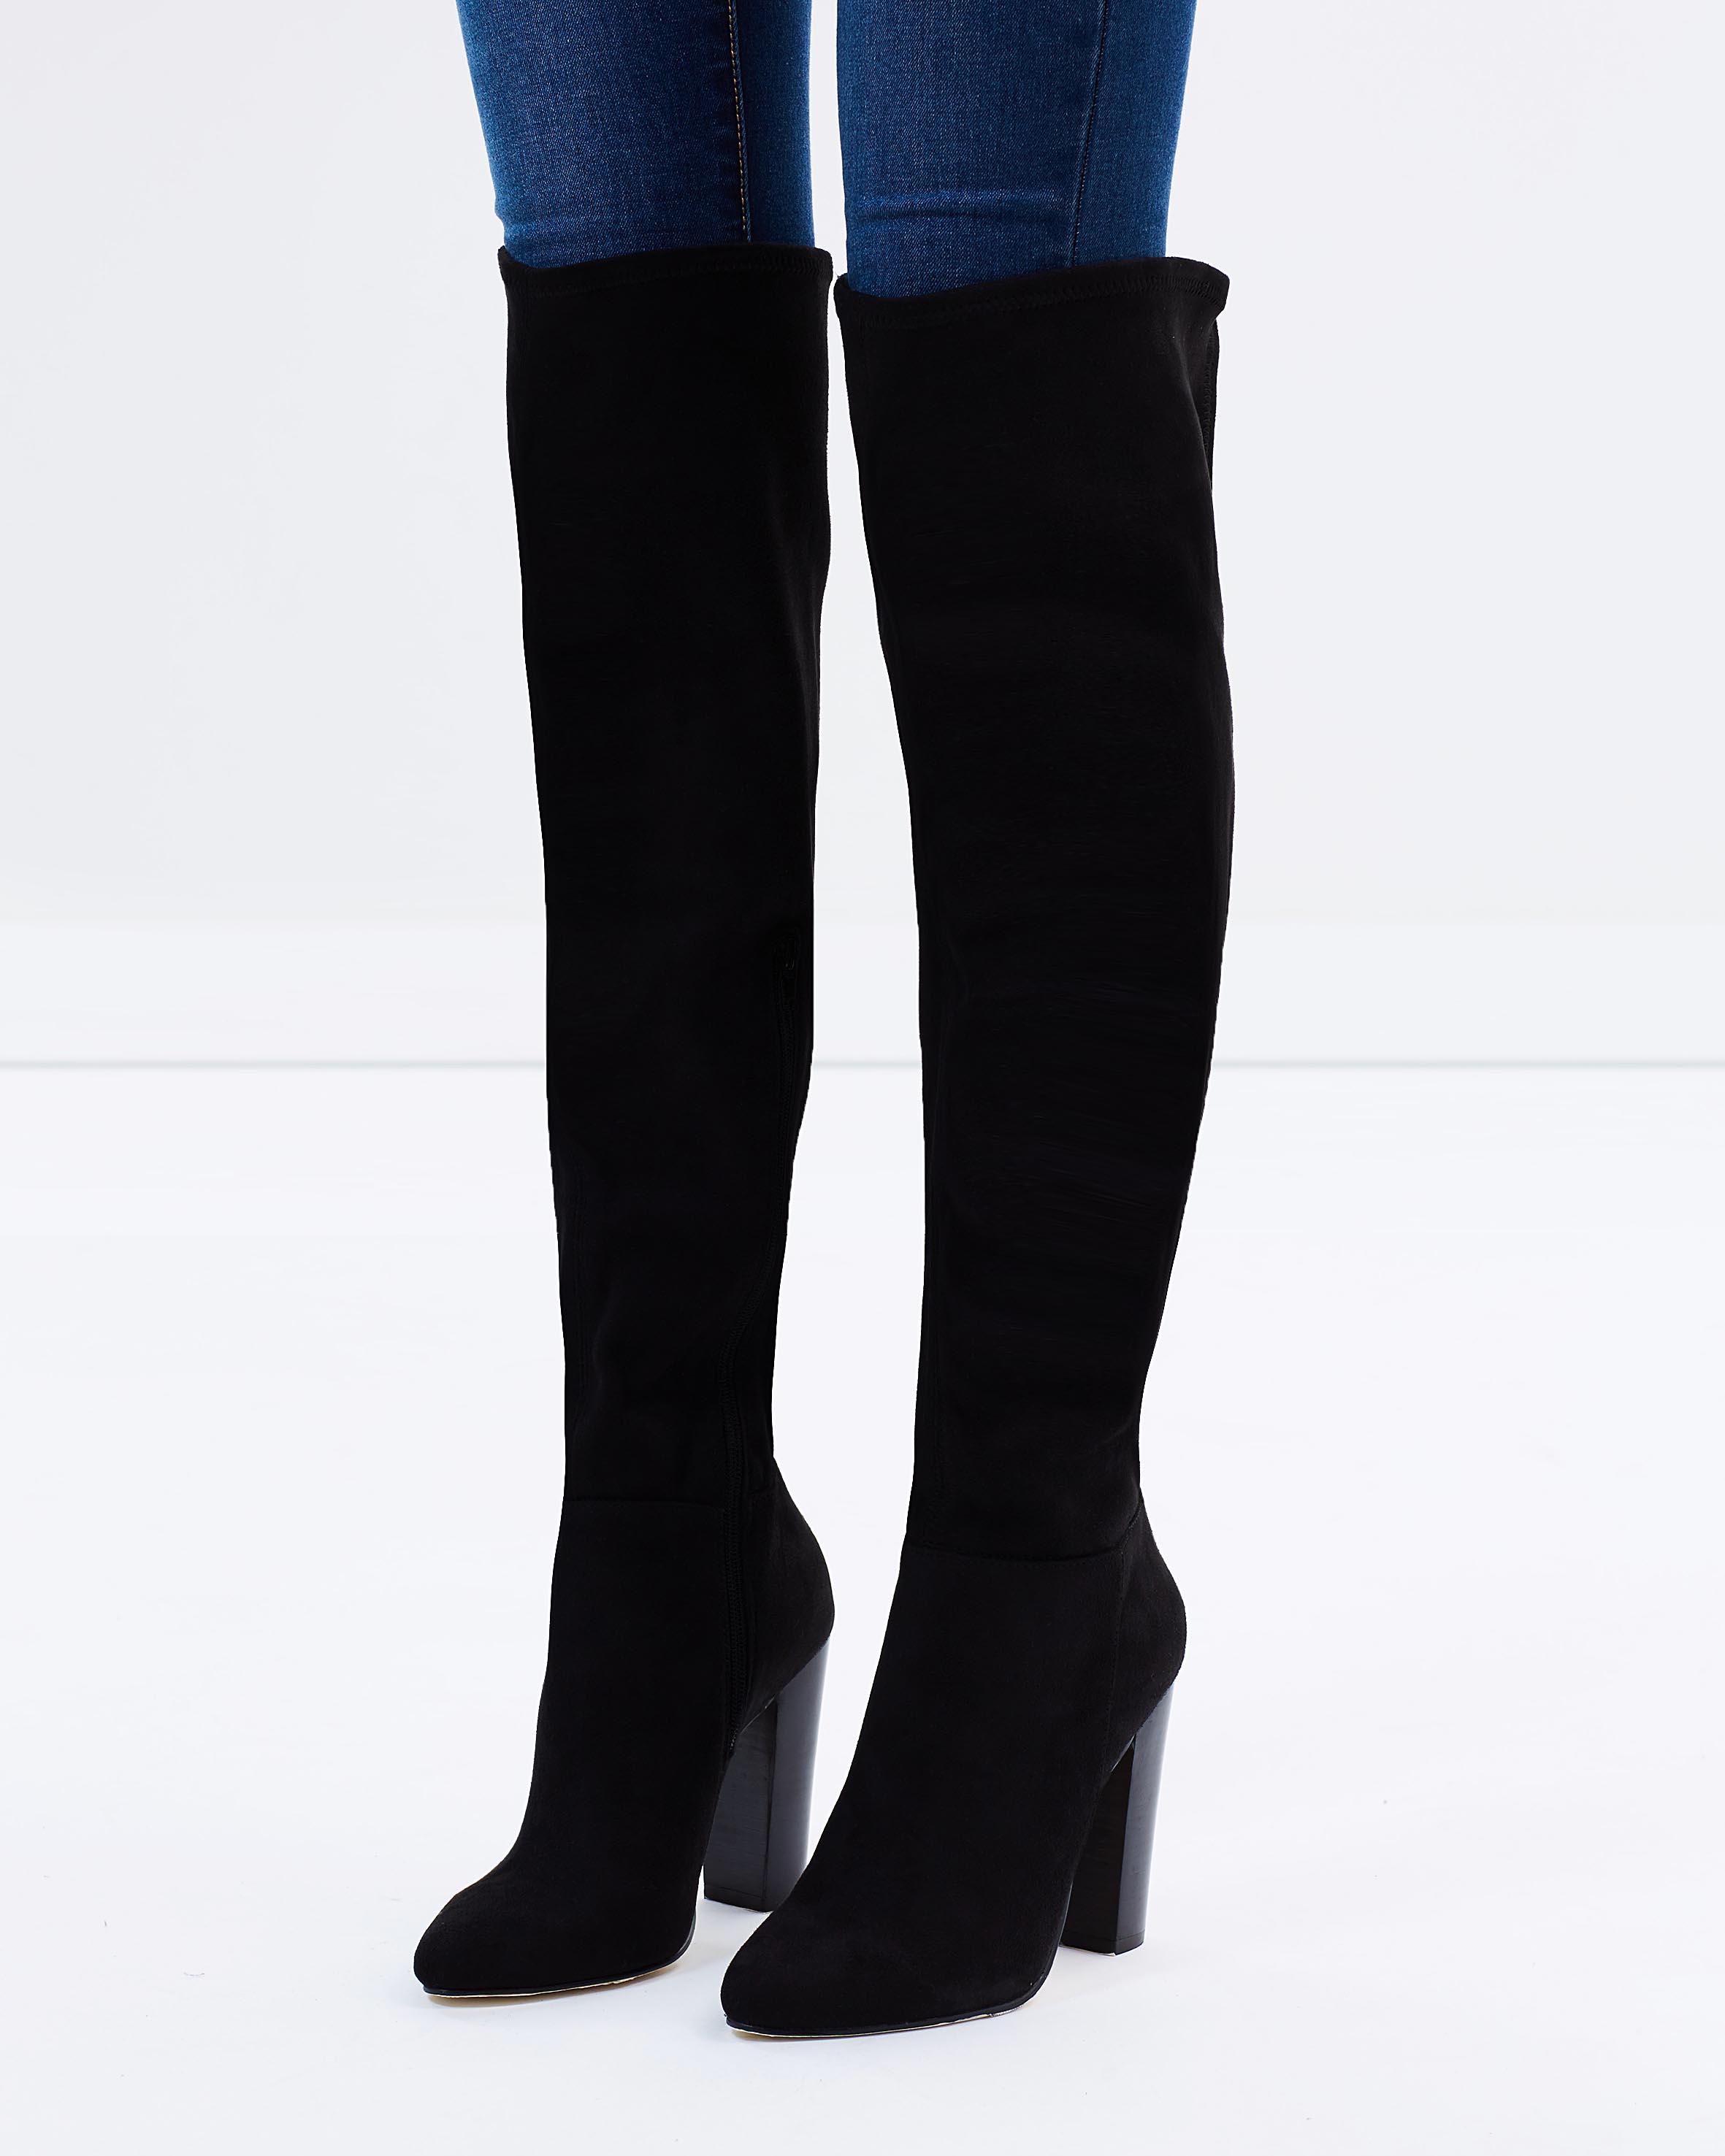 Black suede boots online